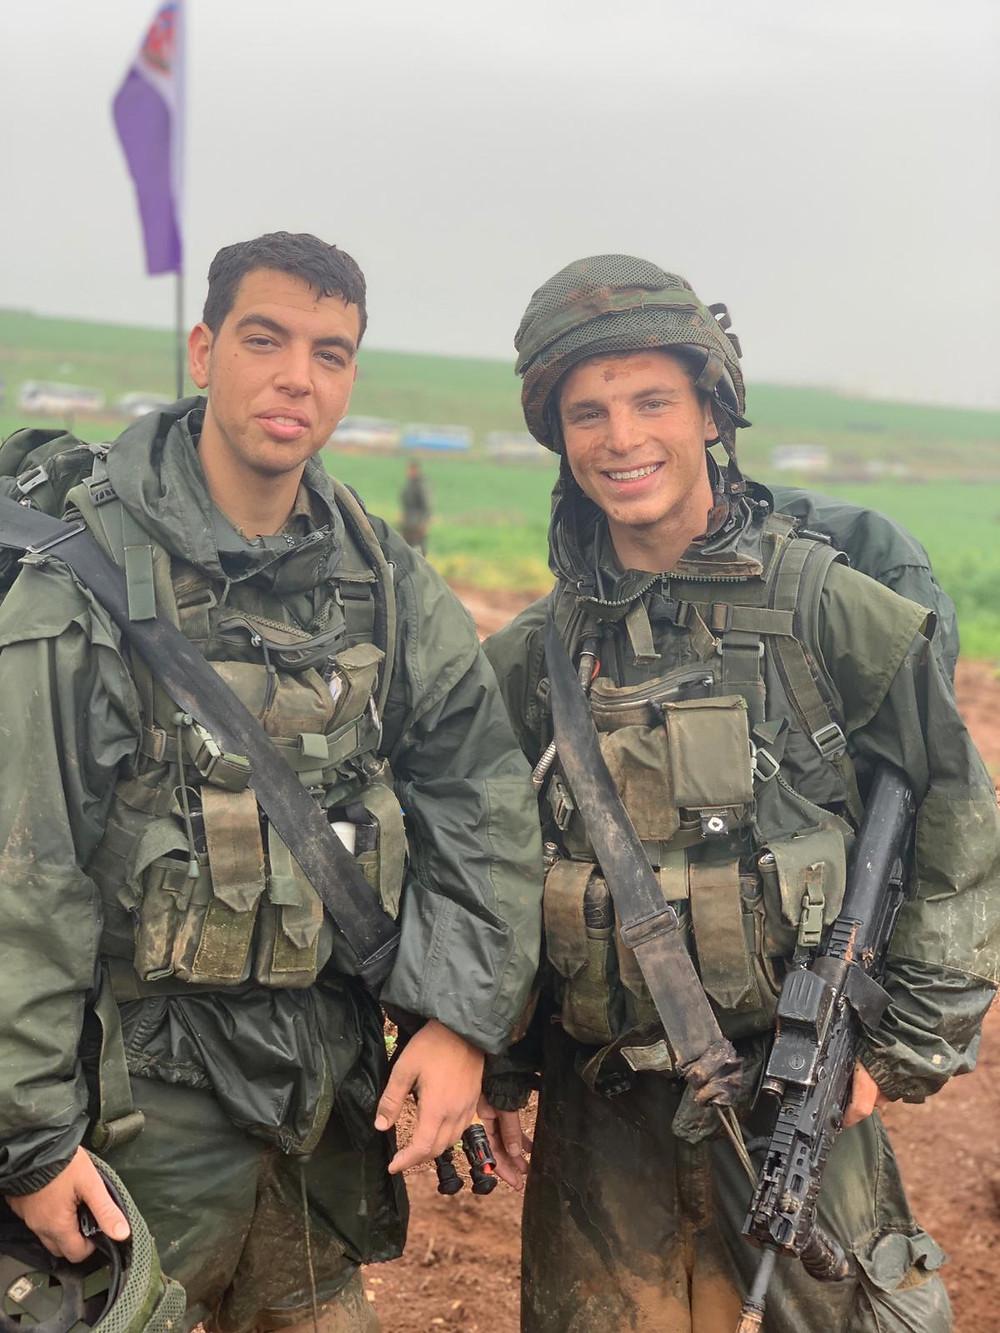 Oleh Shai Goel in his IDF uniform with a fellow soldier